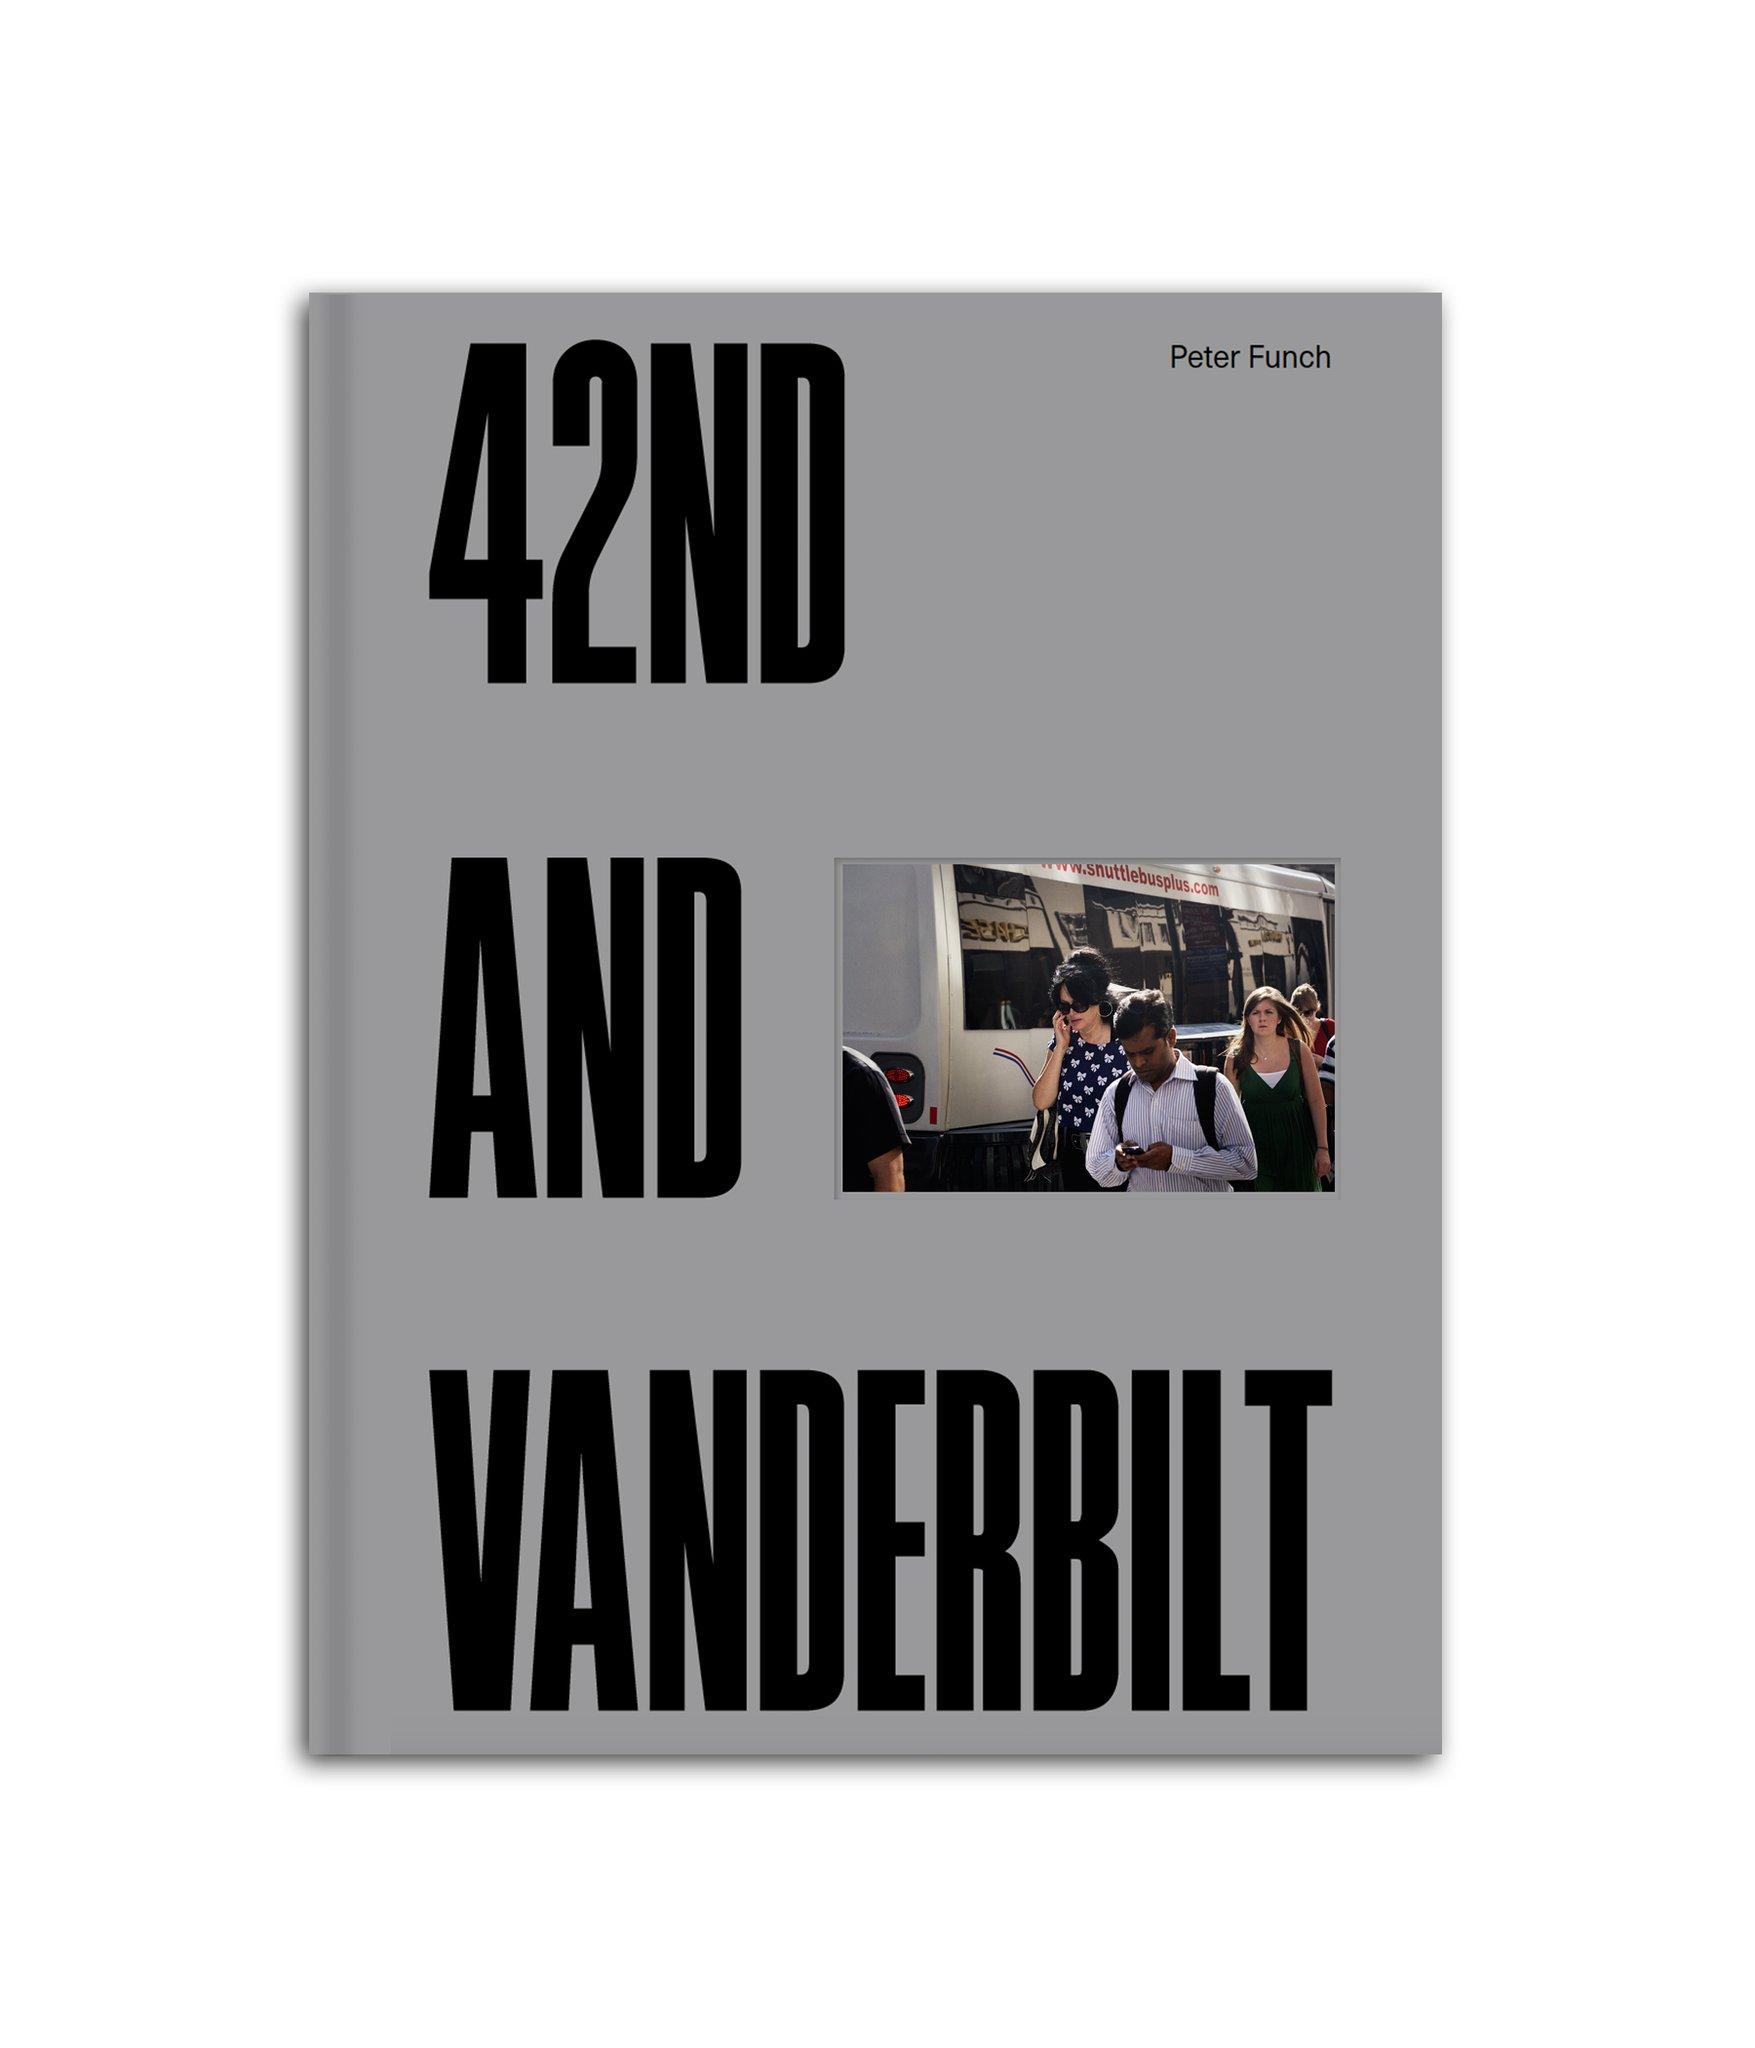 Funch, Peter. 42nd and Vanderbilt